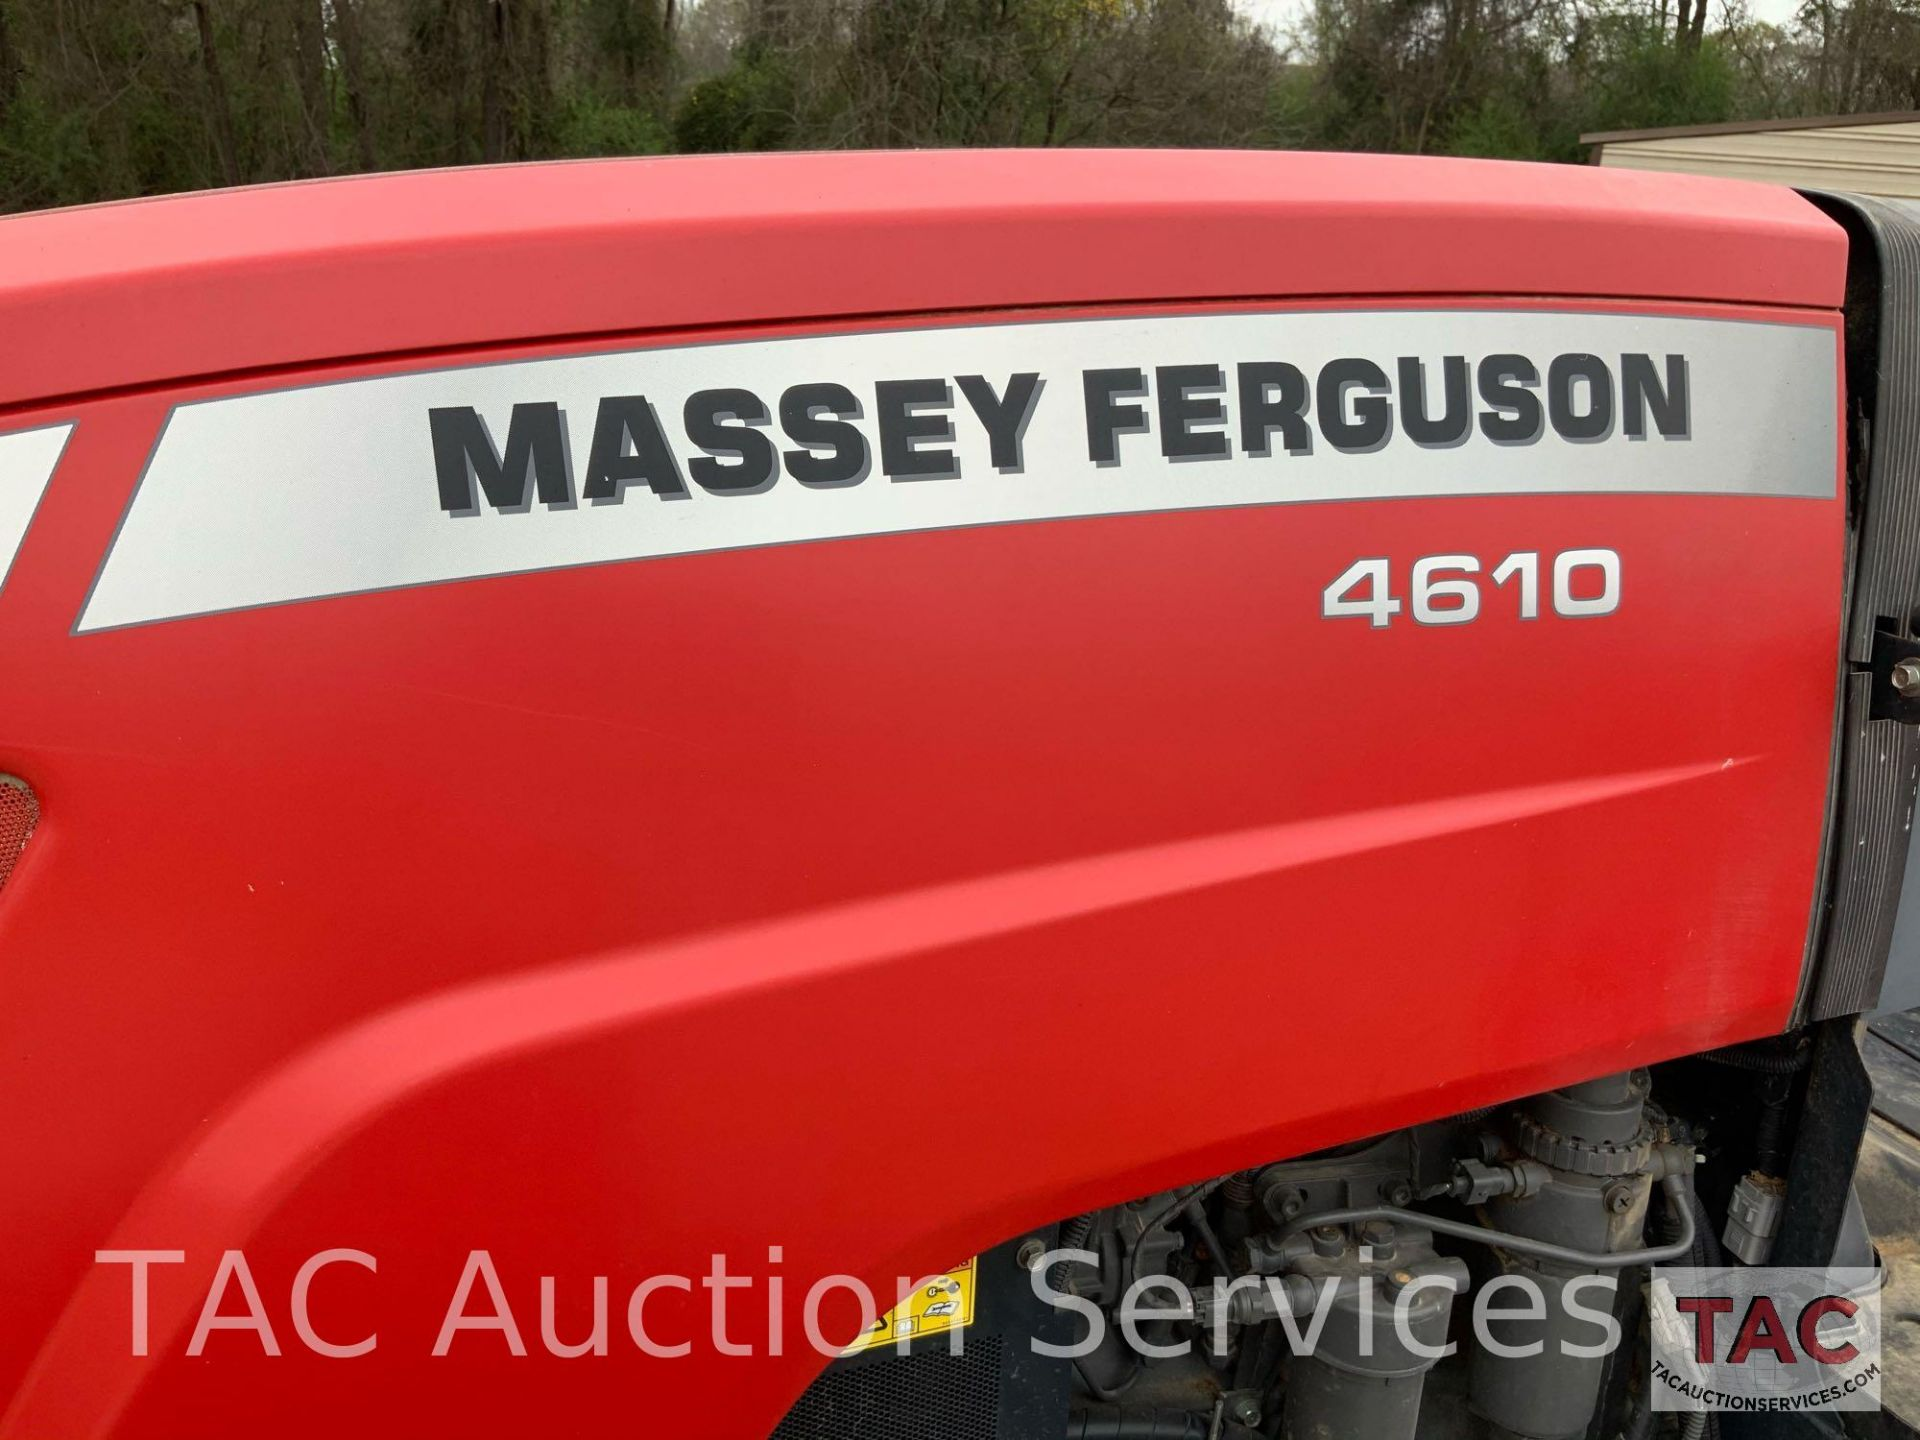 Massey-Ferguson 4610LP Farm Tractor - Image 20 of 26